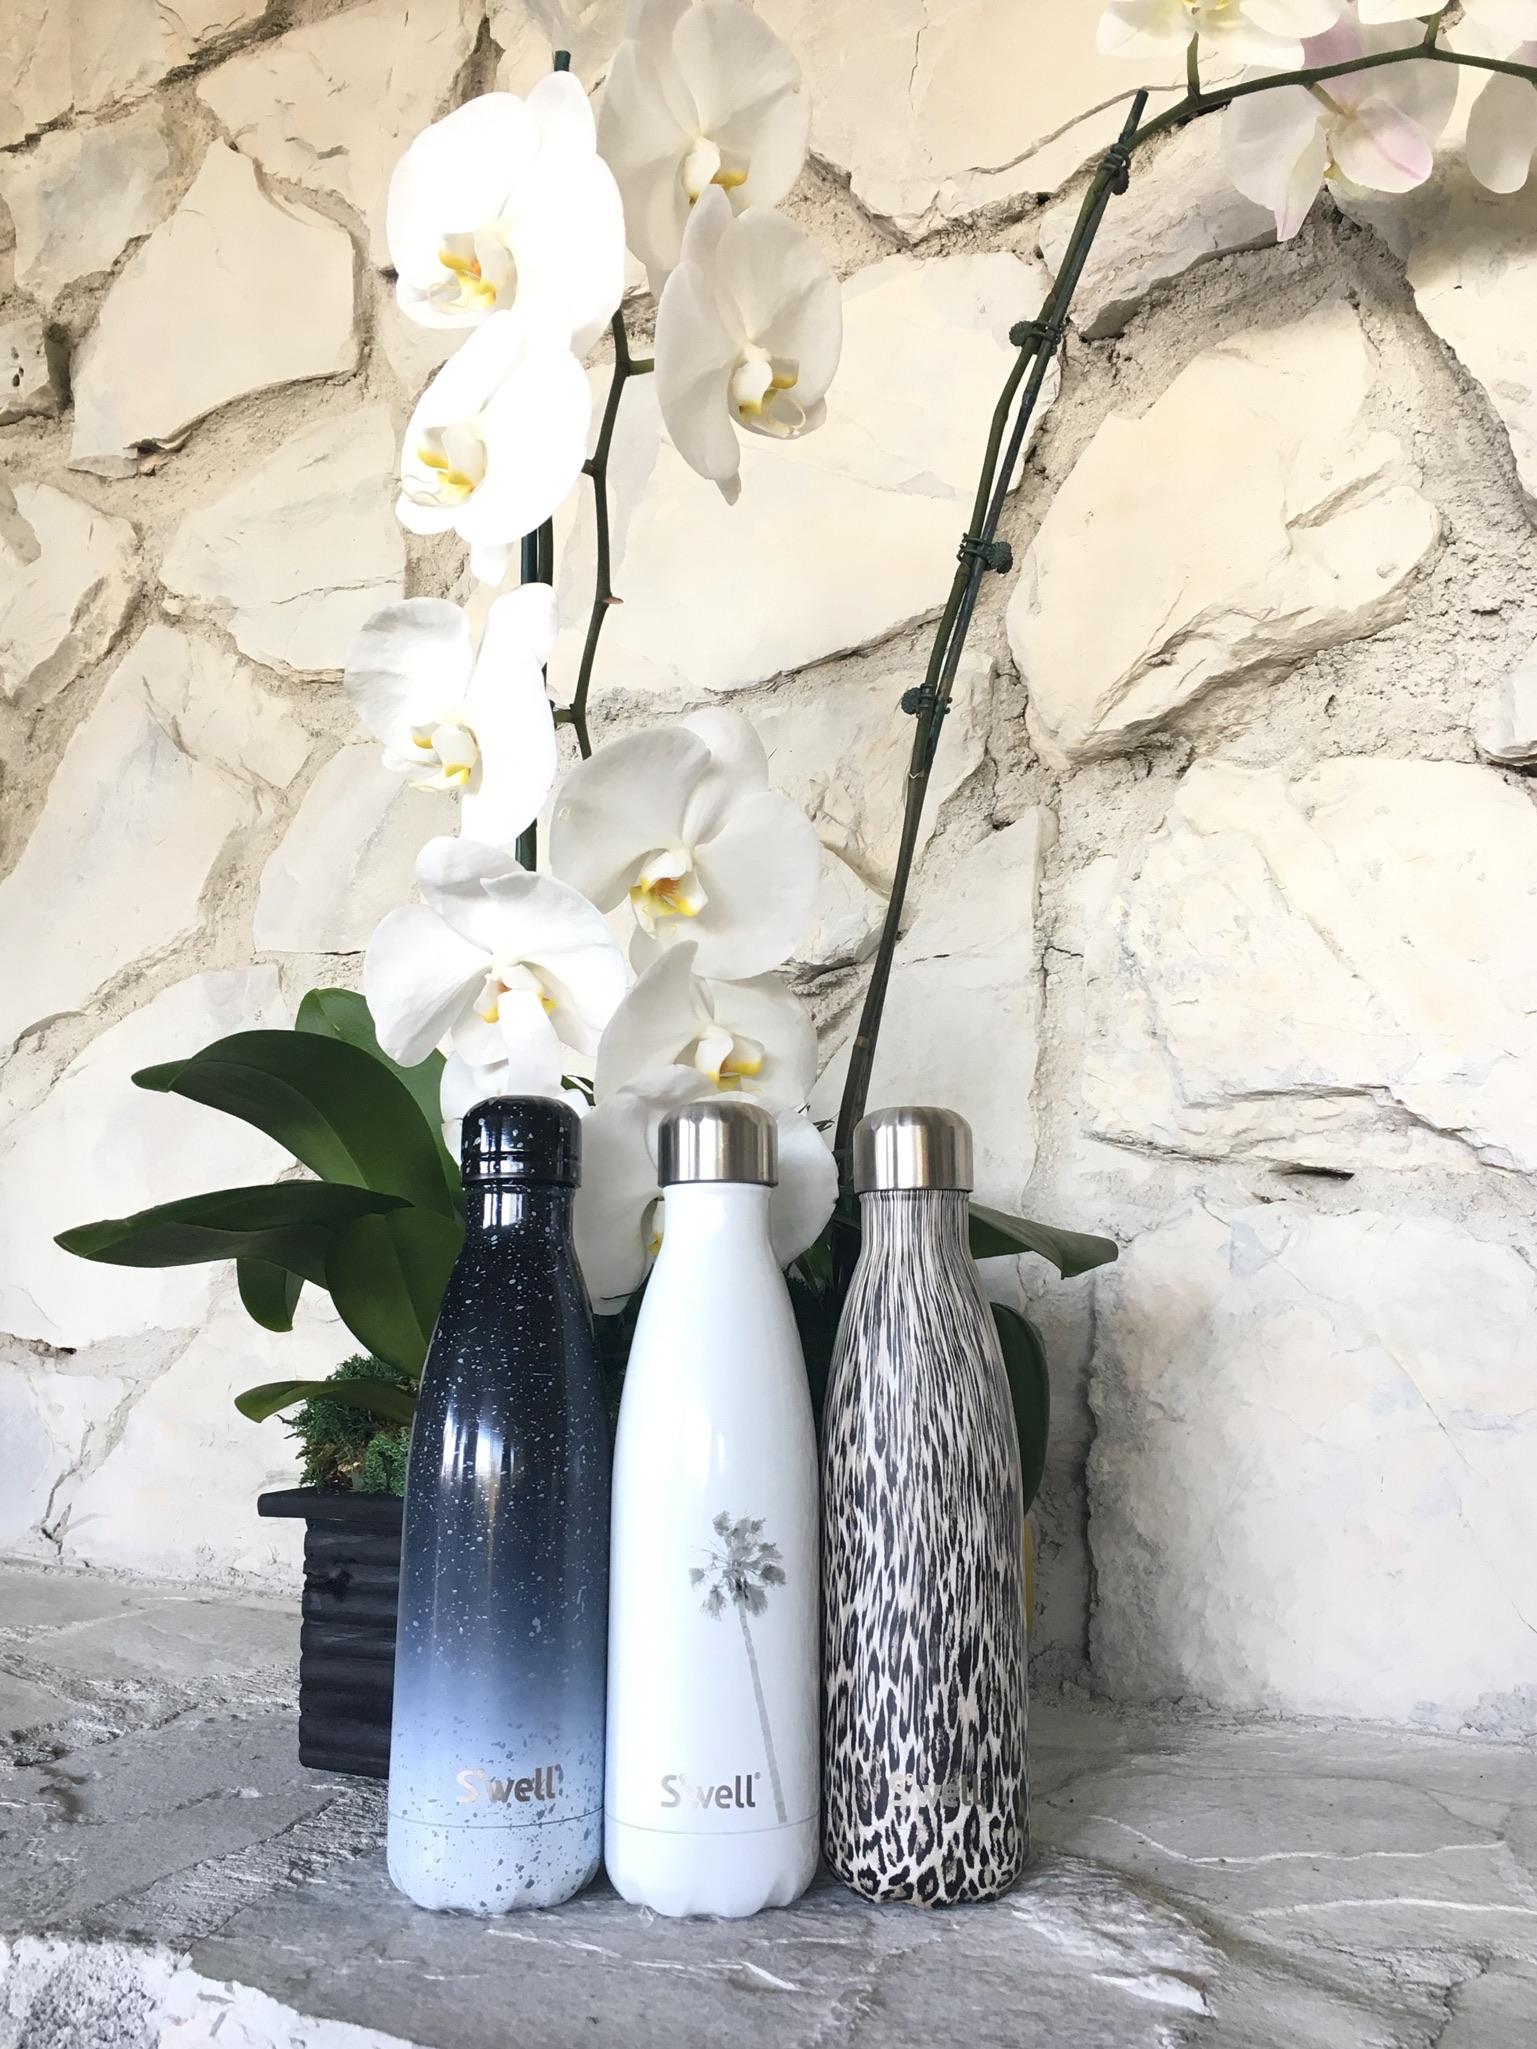 BUY:  Swell water bottles